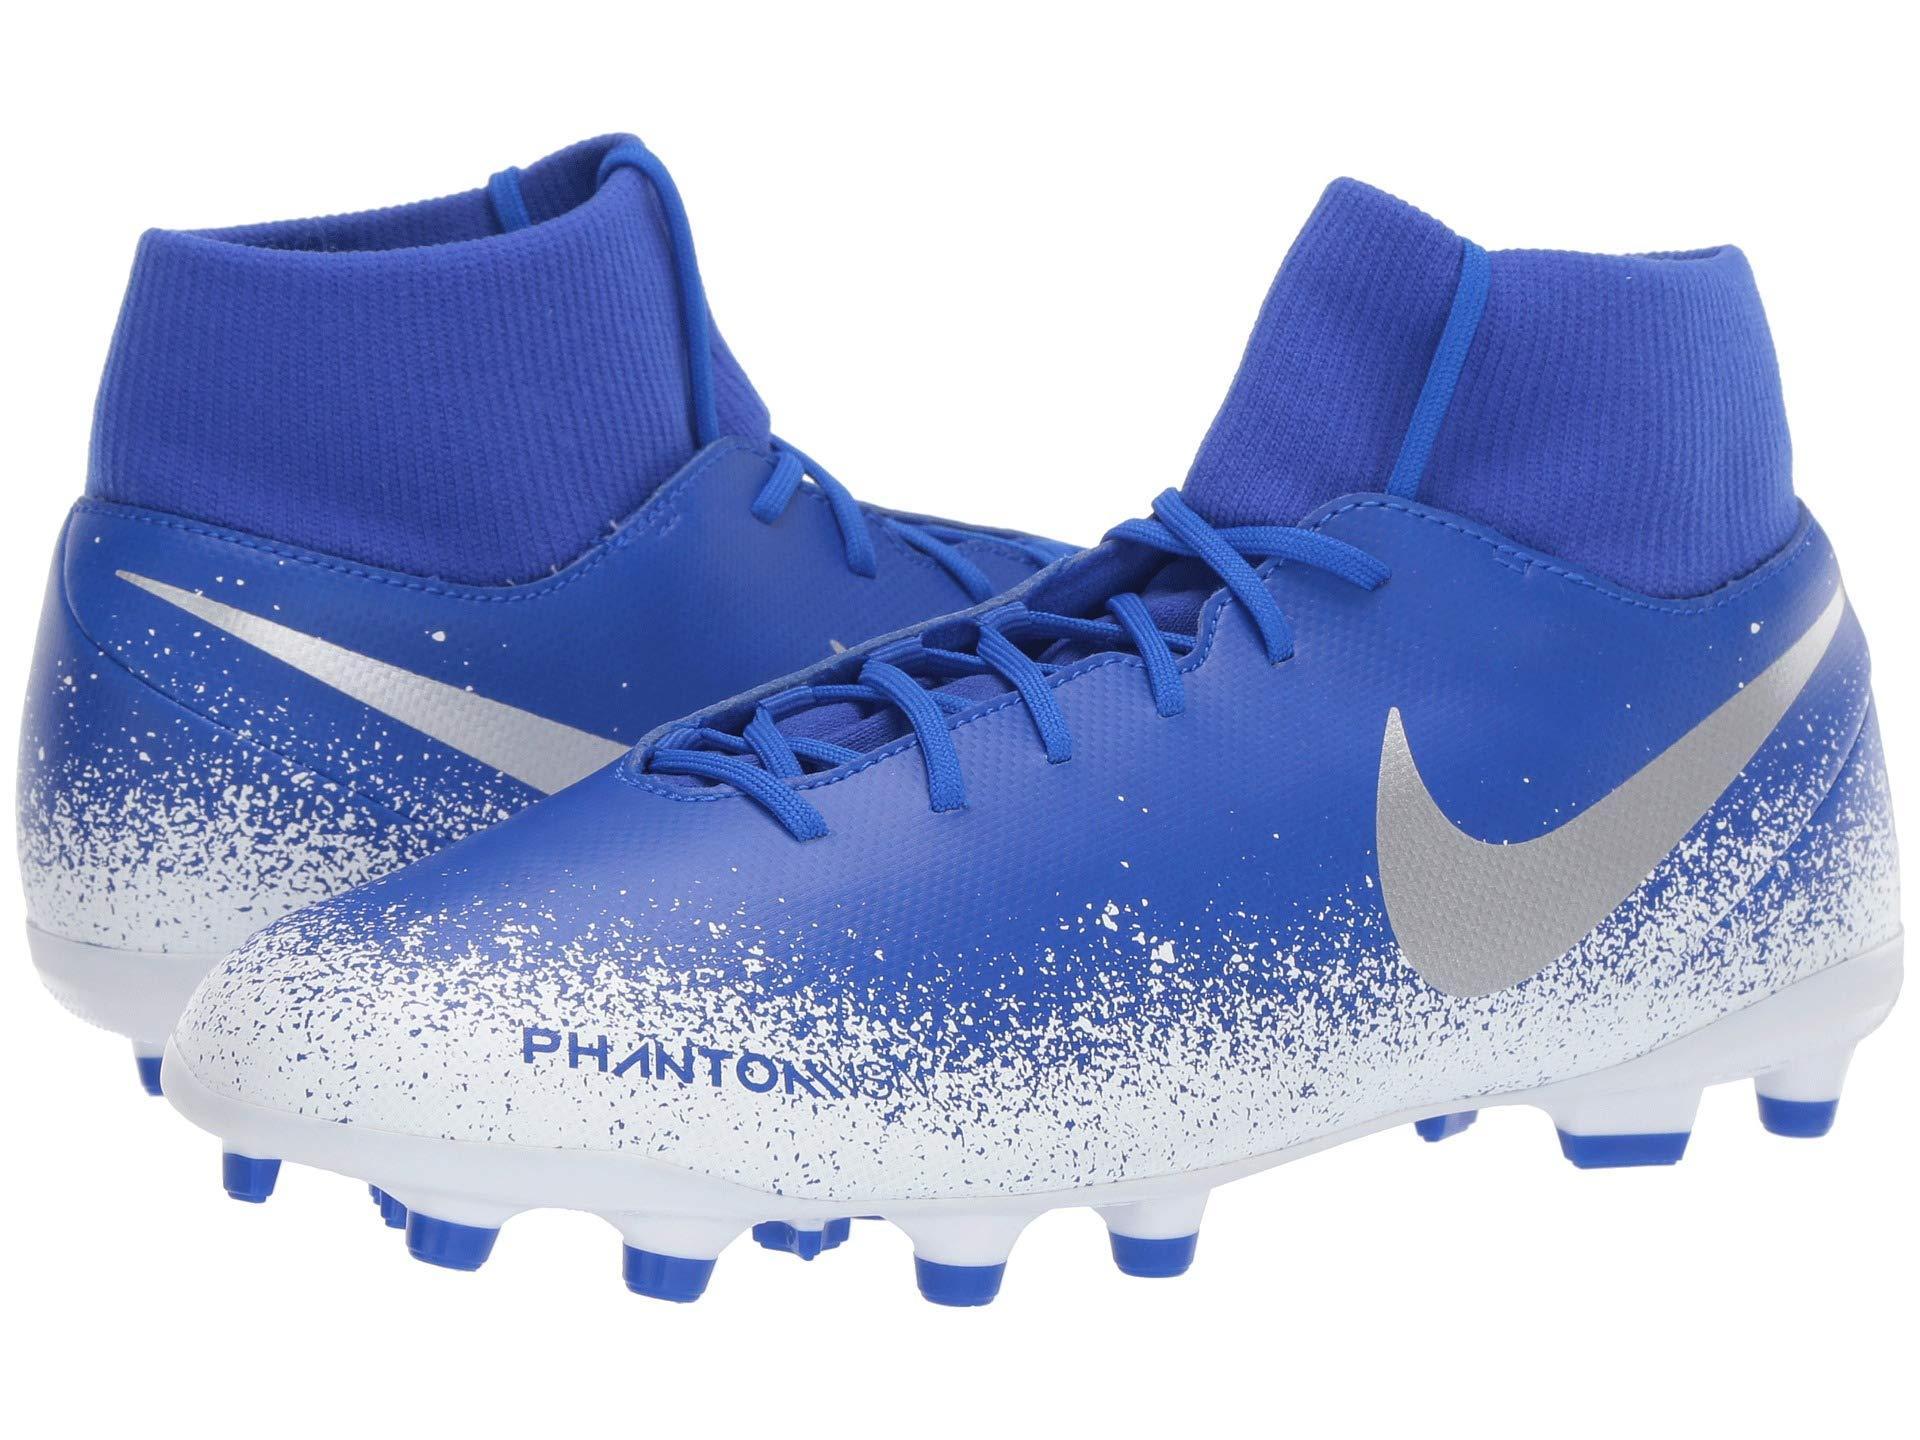 huge selection of 4c430 80c54 Nike. Phantom Vsn Club Df Mg (racer Blue racer Blue black) Men s Soccer  Shoes